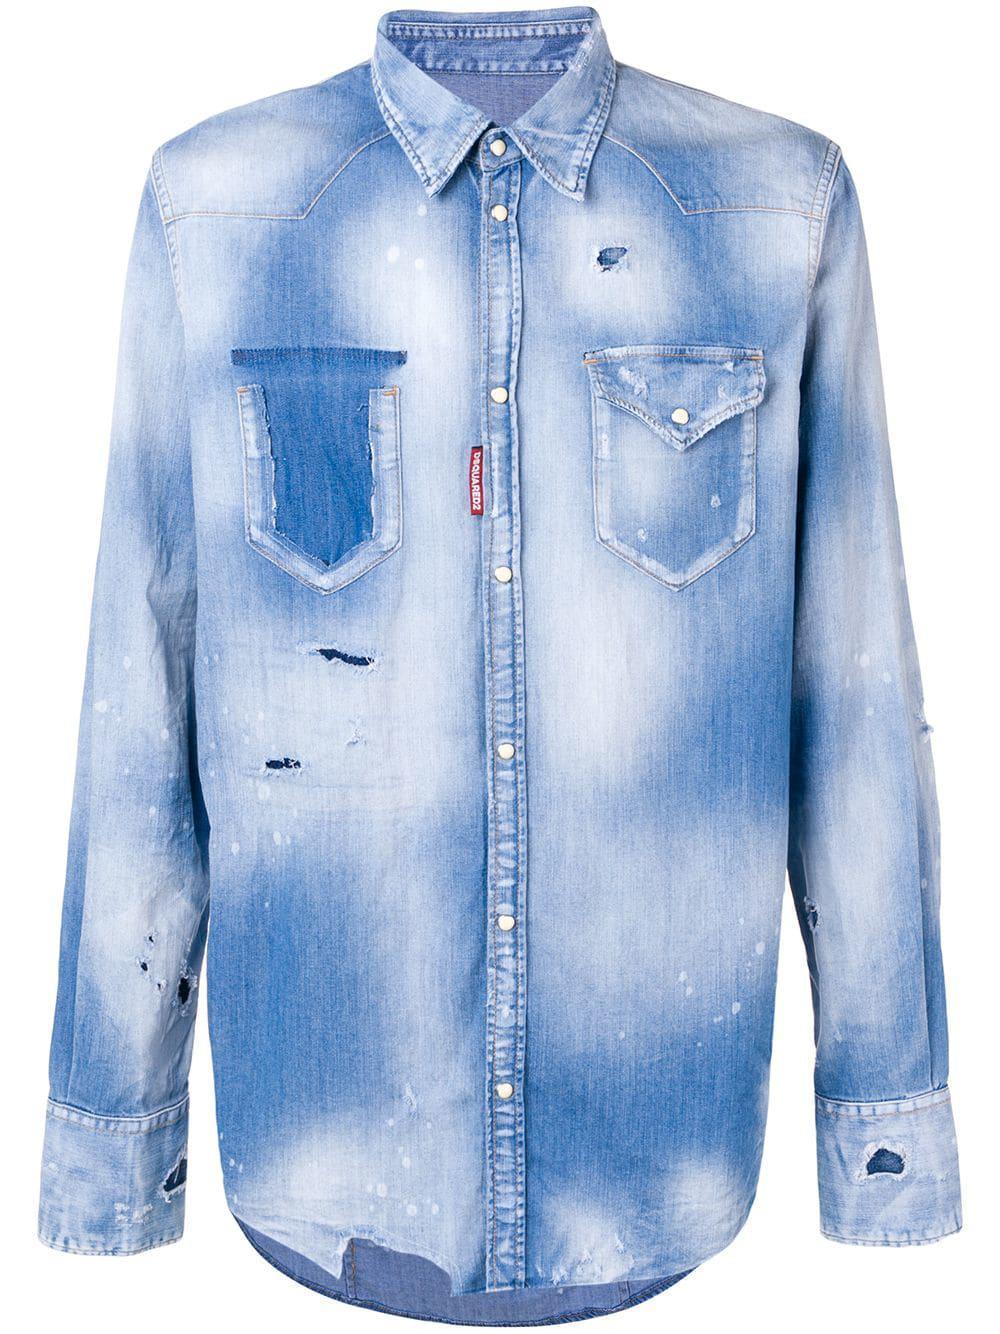 a72fac5d99 Lyst - Dsquared² Denim Shirt in Blue for Men